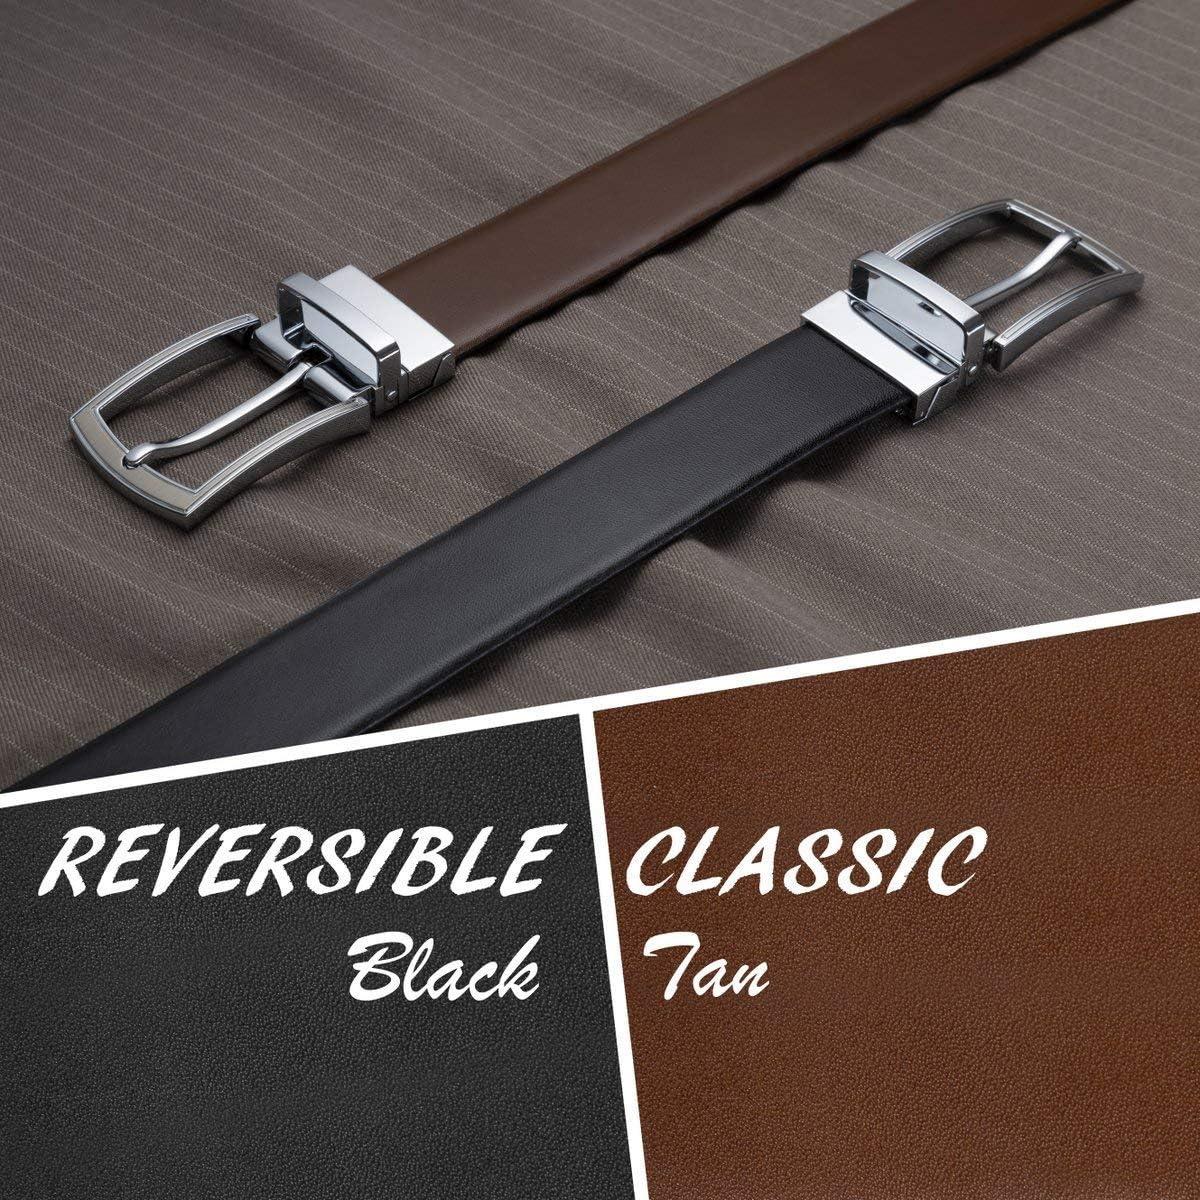 Men's Reversible Classic Dress Belt Italian Top Grain Leather Black & Brown Rotating Buckle by Prospero Comfort